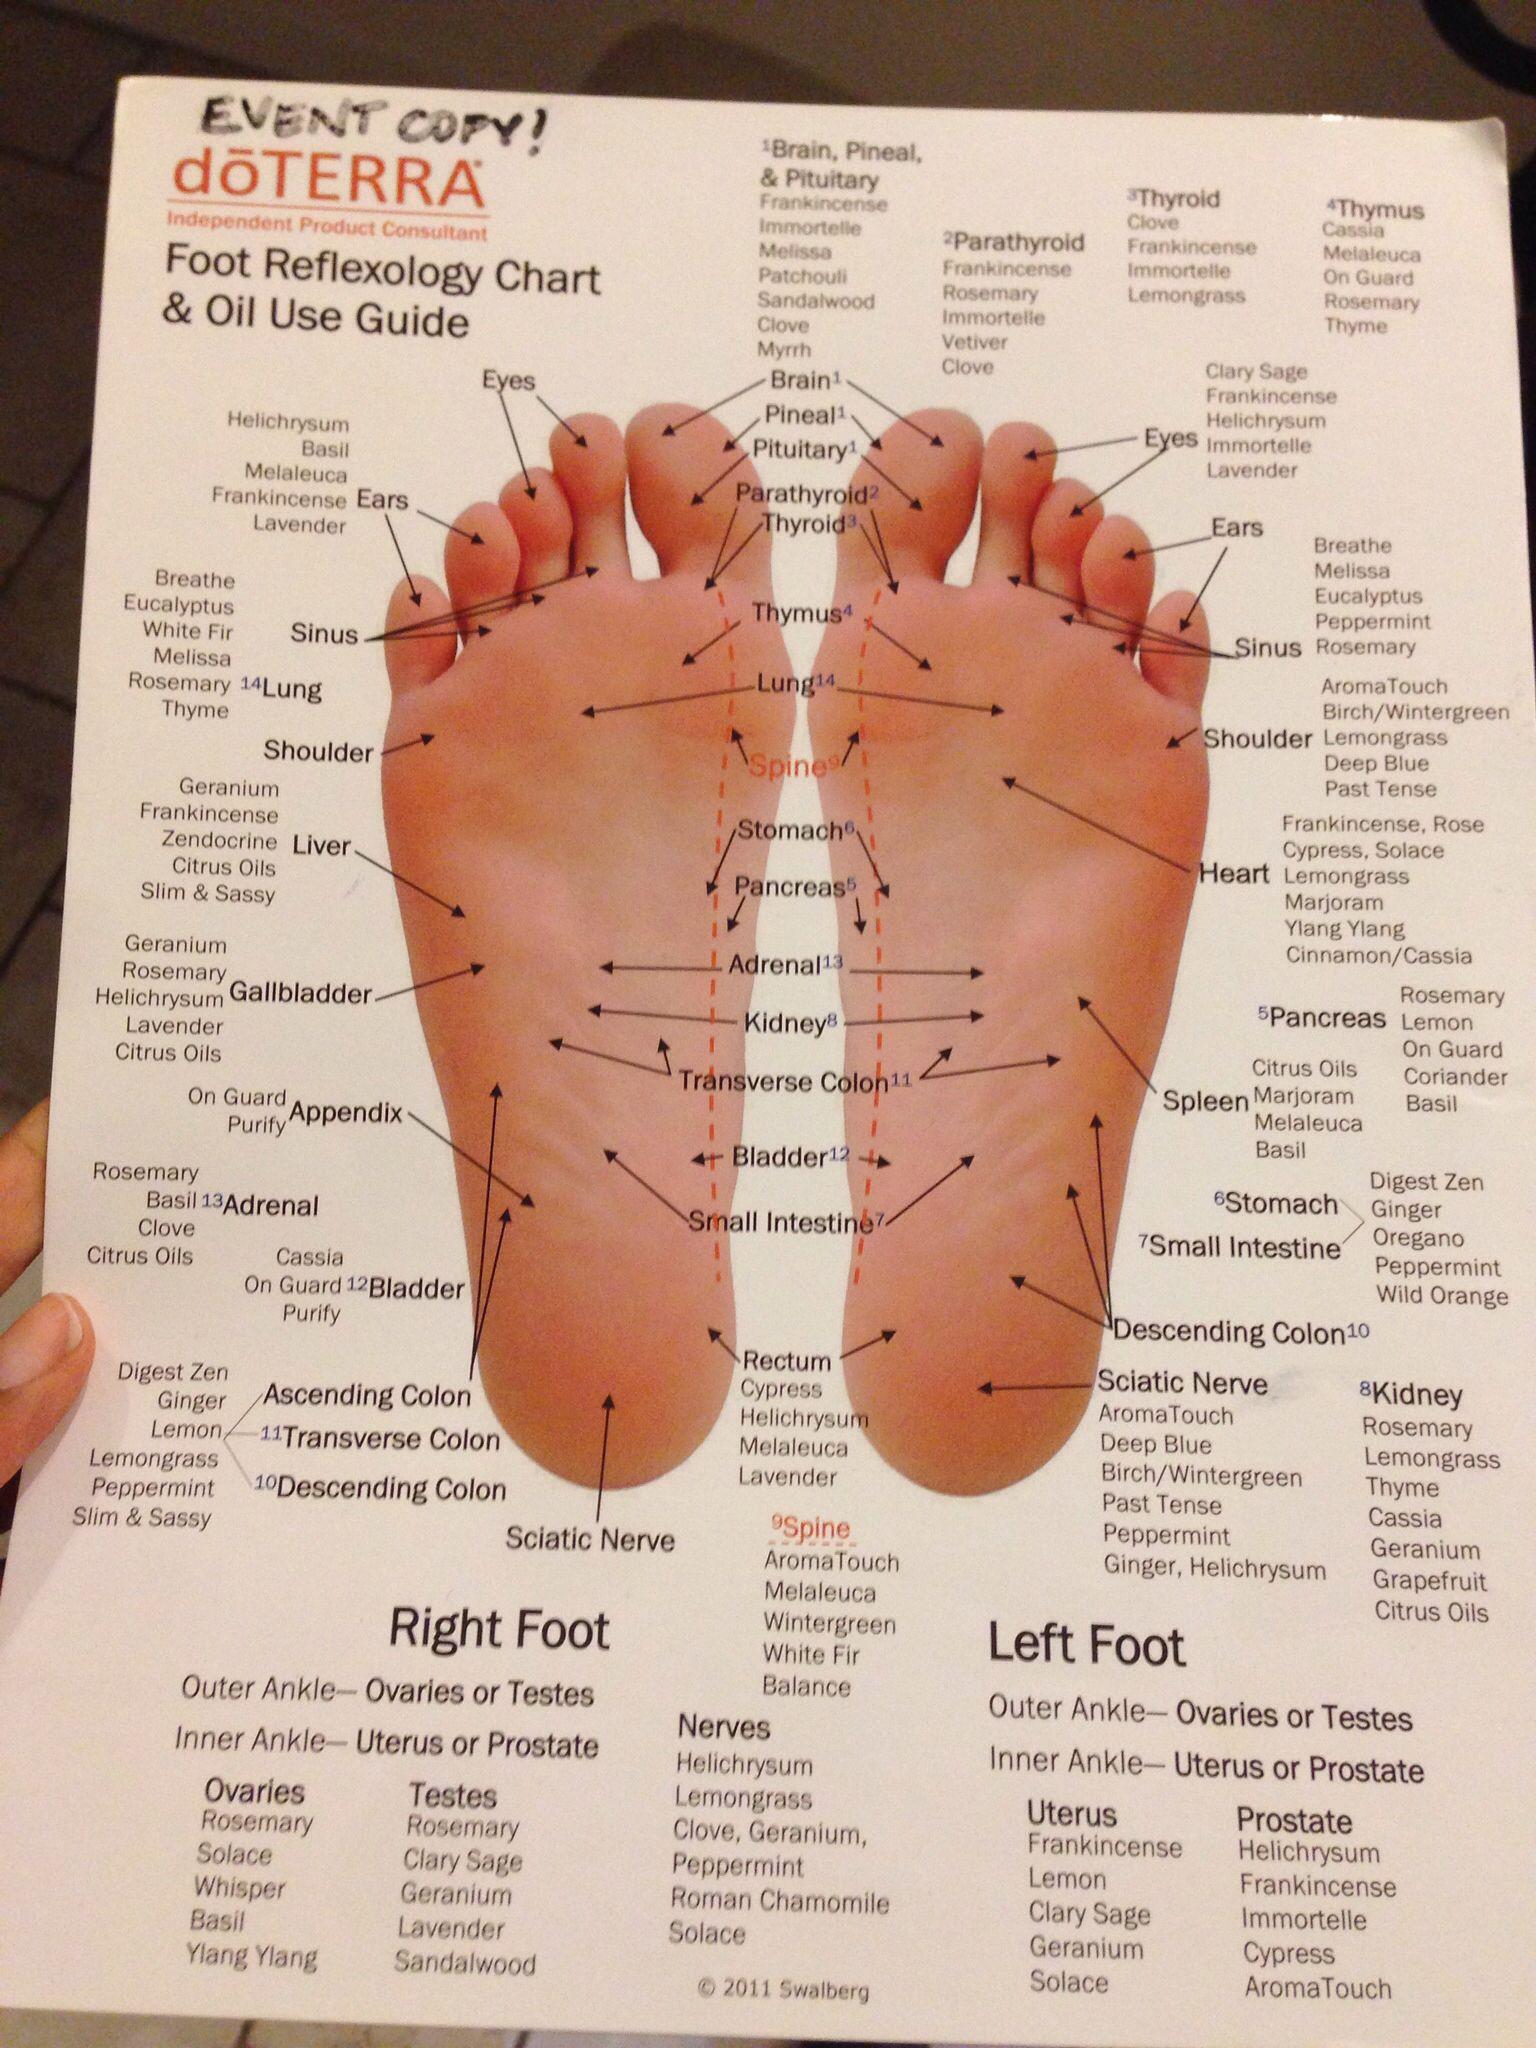 Reflexology with doterra essential oils natural medicine also chart ibovnathandedecker rh